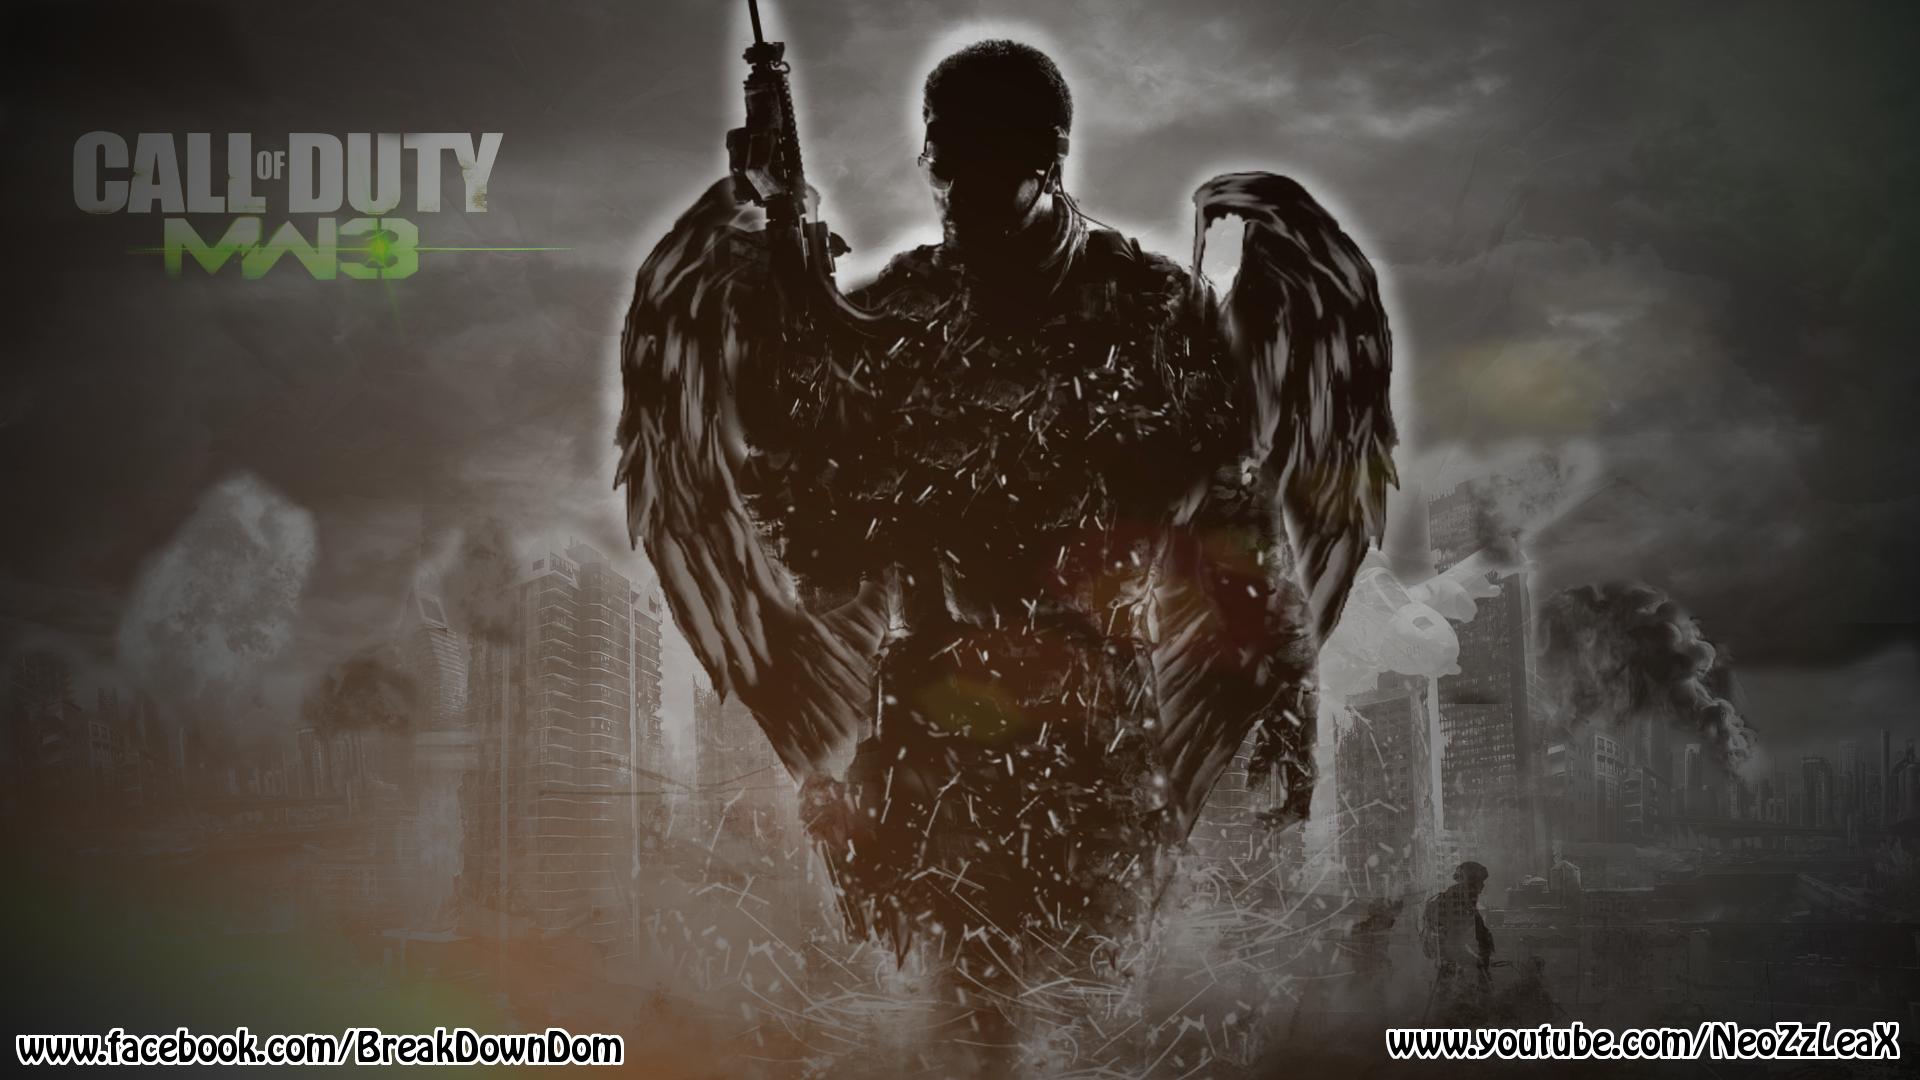 Call Of Duty Modern Warfare 3 Wallpaper By Neozzleaxdesignzz On